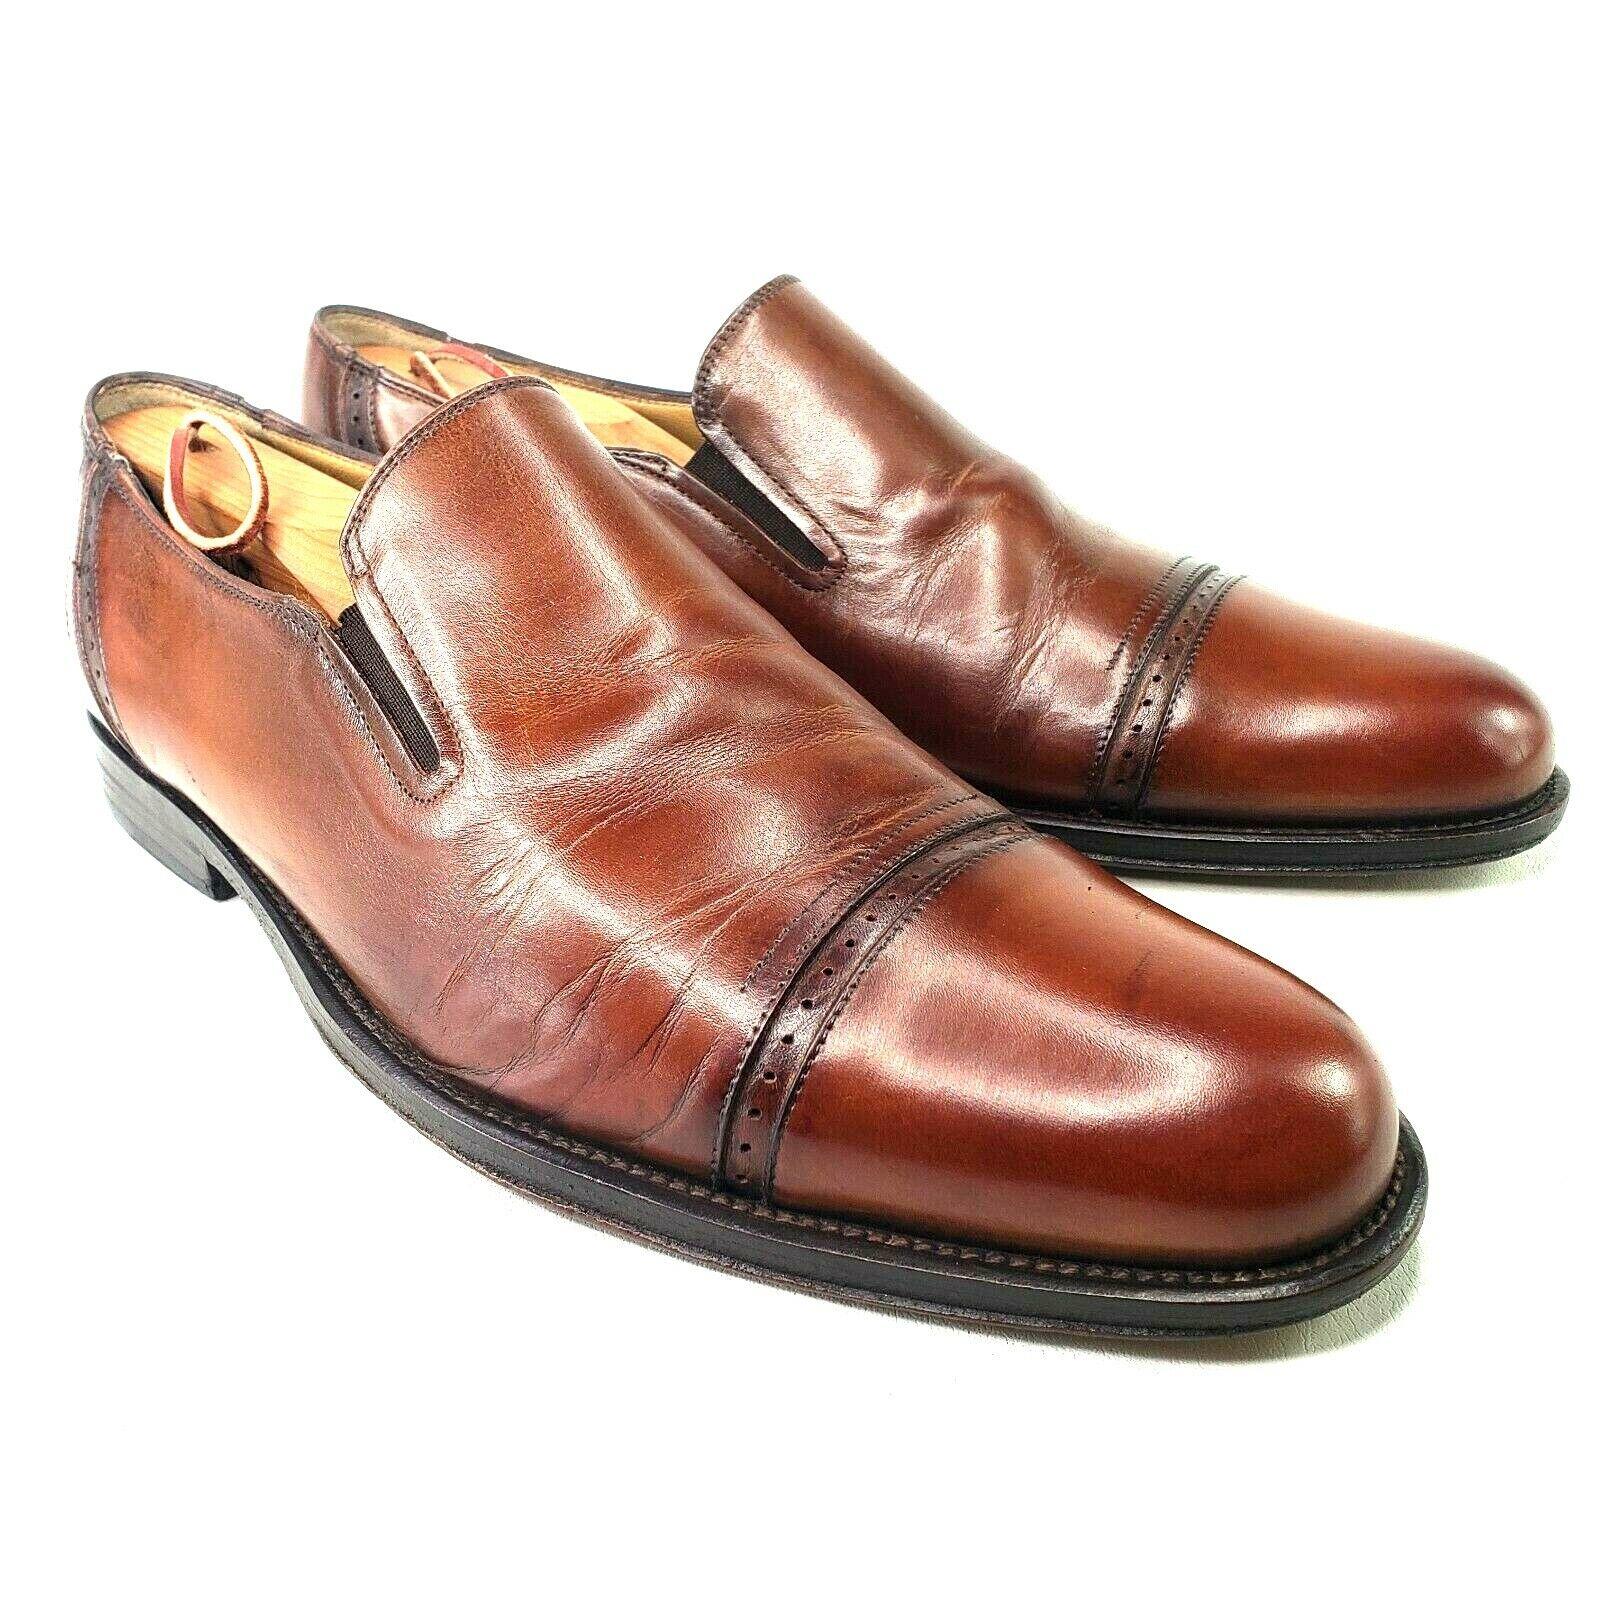 Johnston Murphy Handcrafted in Italy Cap Toe Slip On Size 10 Cognac Brown Brogue